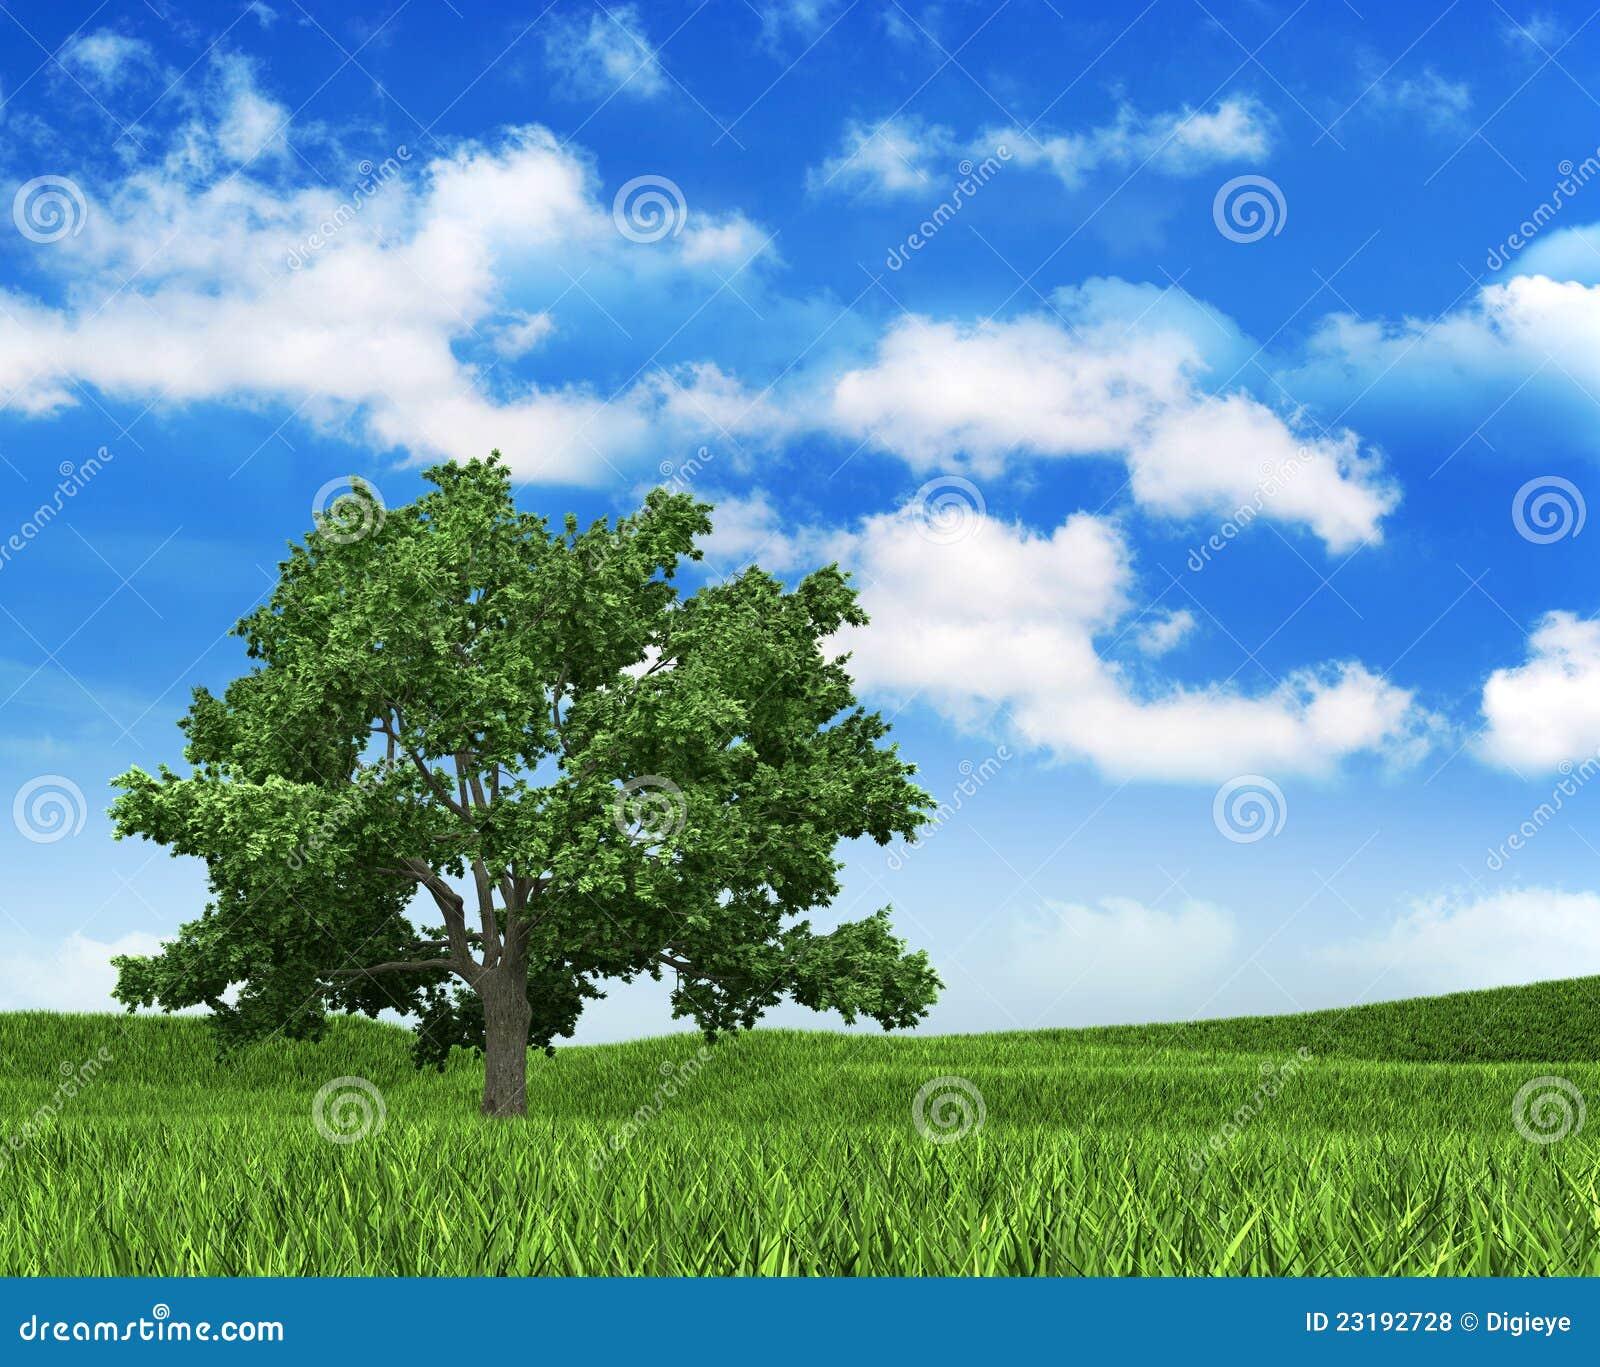 Fond De Nature Ciel Herbe Et Arbre Photos Libres De Droits Image 23192728